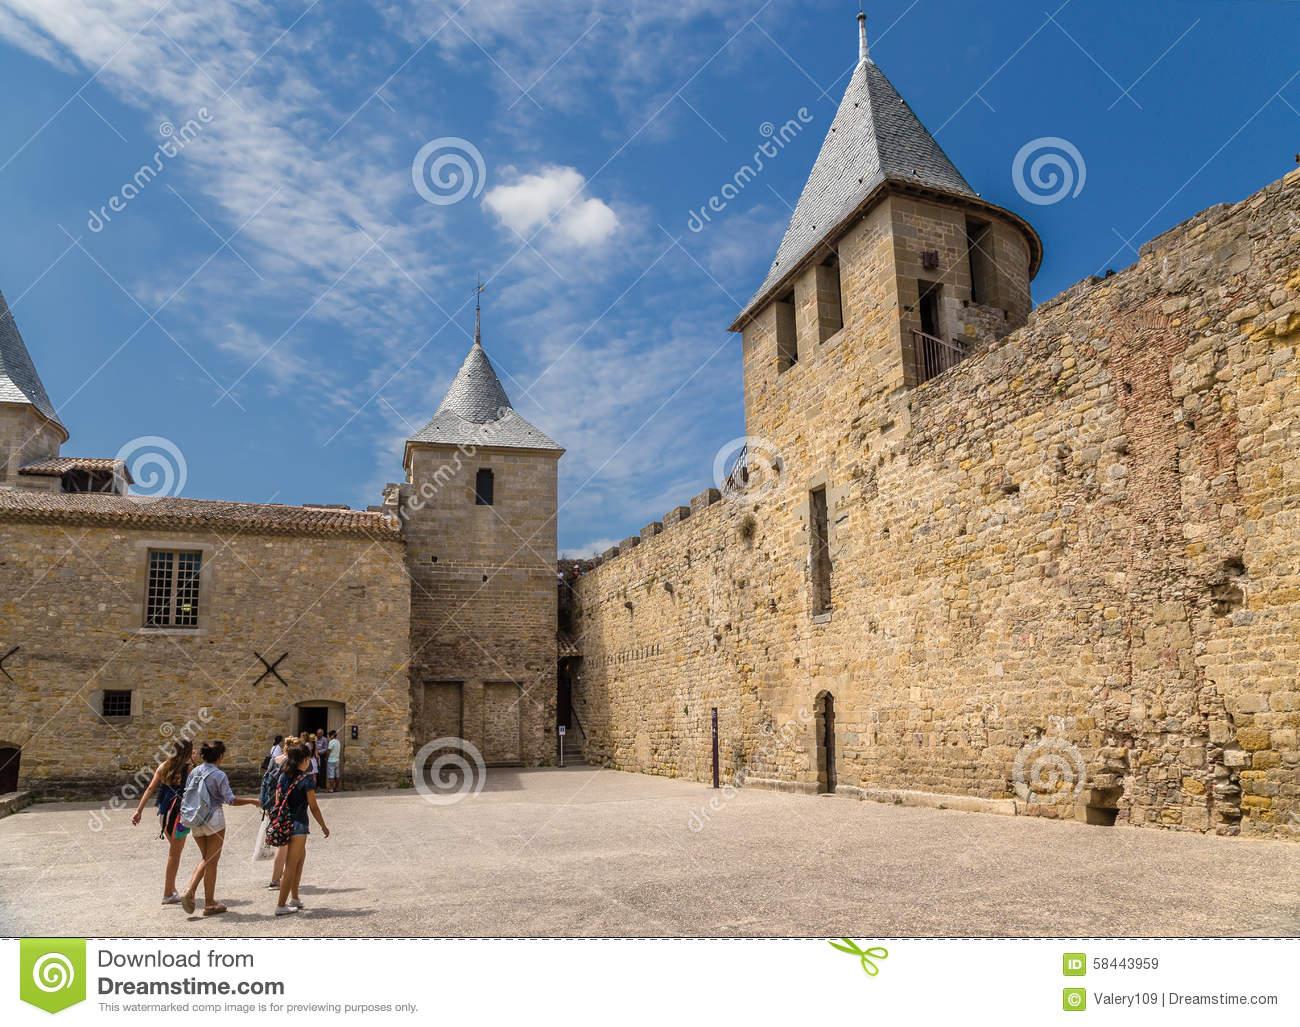 Castle courtyard wall clipart.